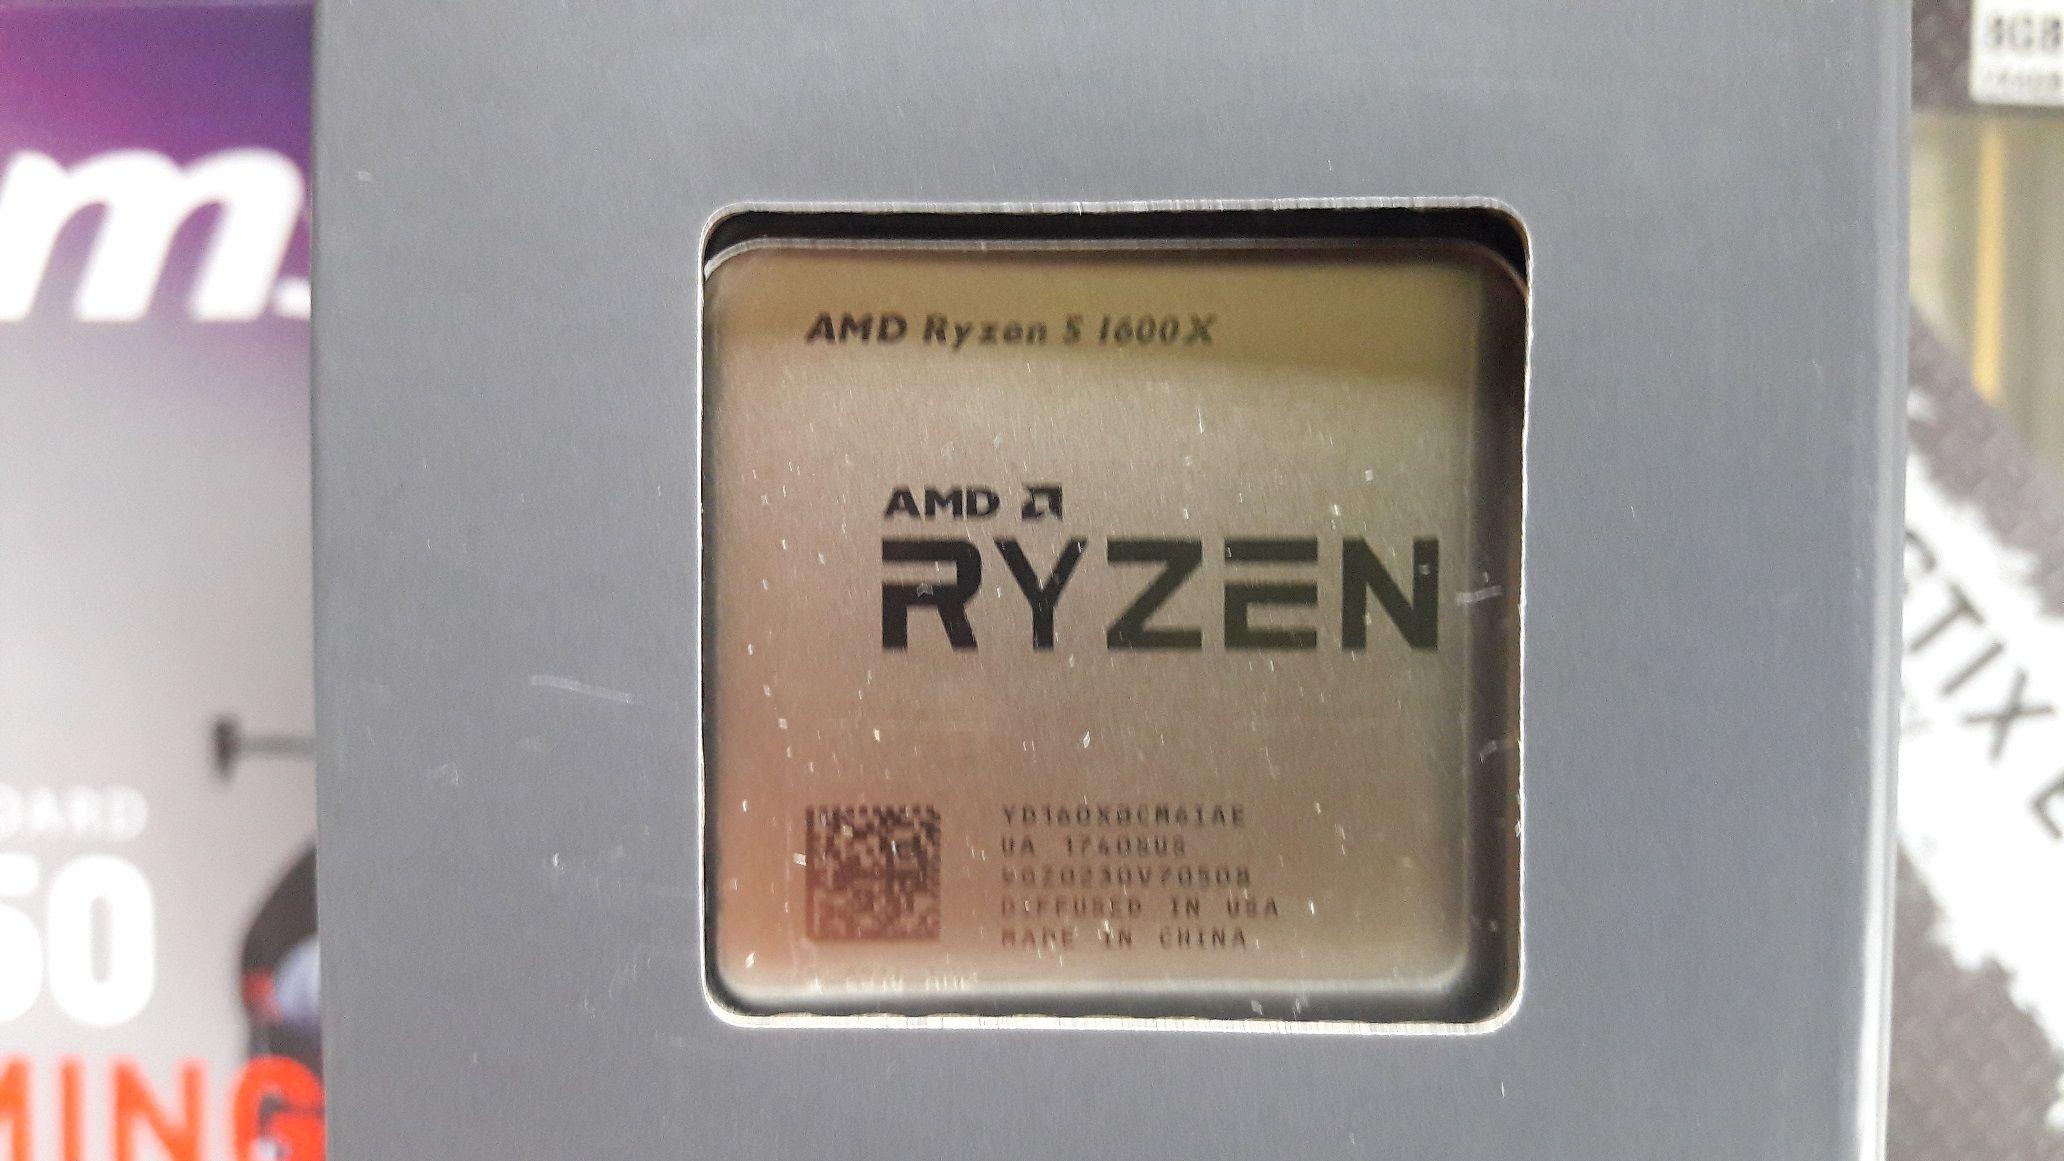 ryzen 5 1600x overclocking guide